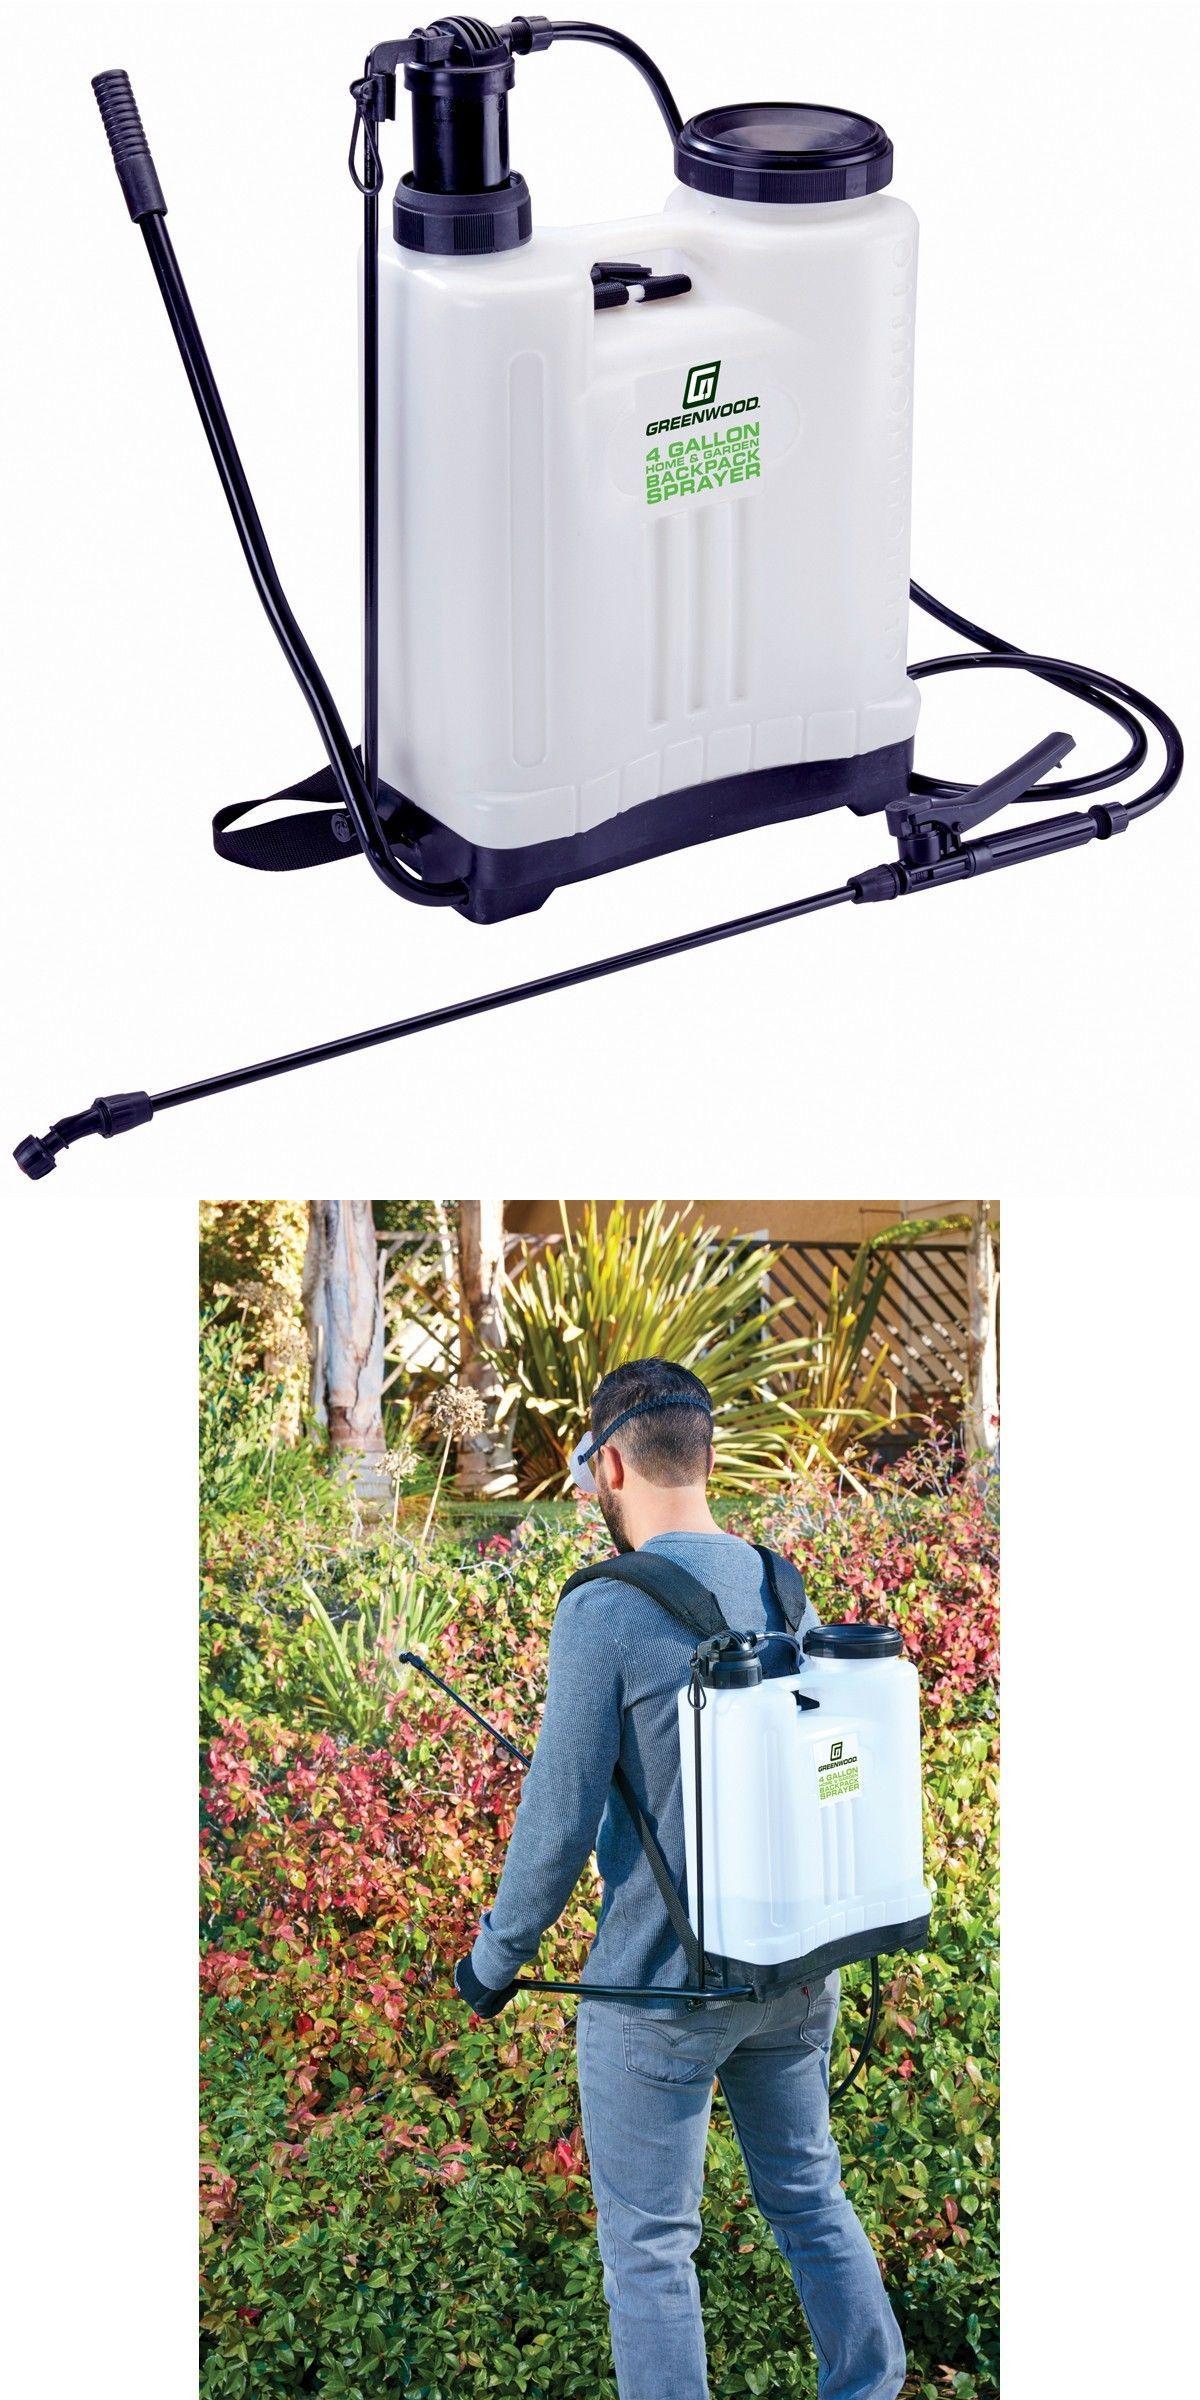 Garden Sprayers 178984: Backpack Garden Sprayer 4 Gallon Pesticide Fertilizer 4 Nozzles Weed Control -> BUY IT NOW ONLY: $39.97 on eBay!